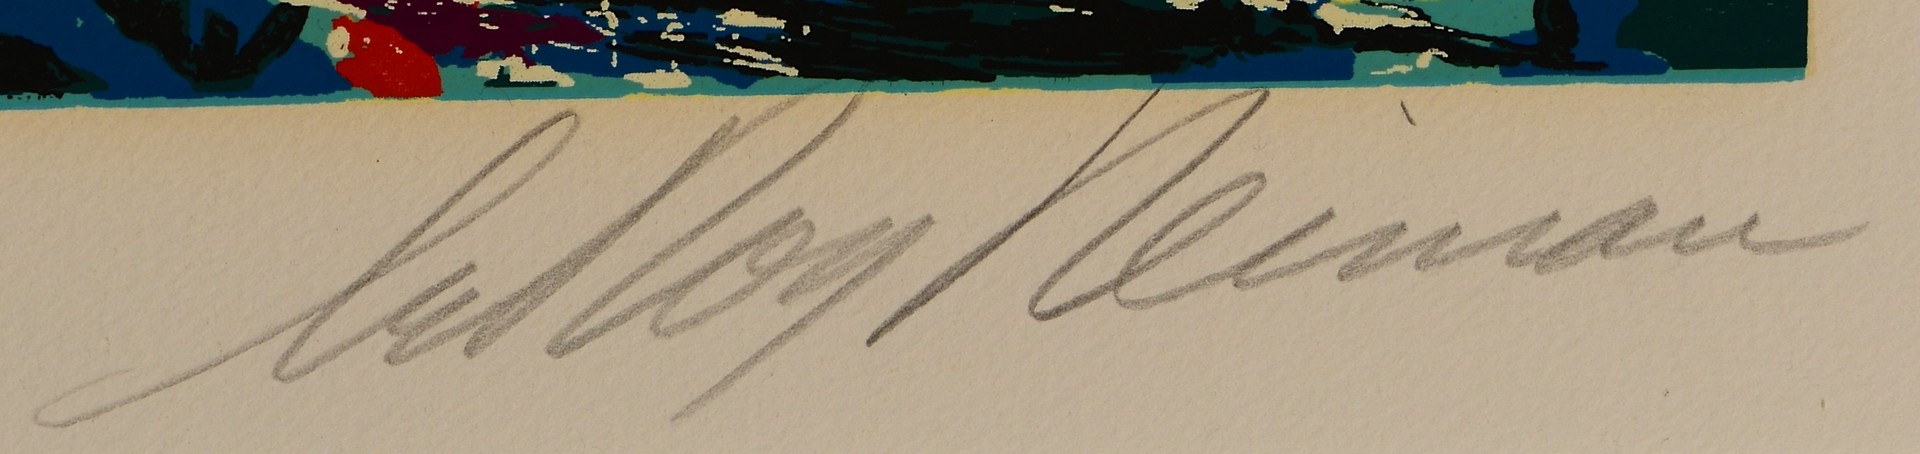 Lot 447: LeRoy Neiman Signed Serigraph, Regents Park